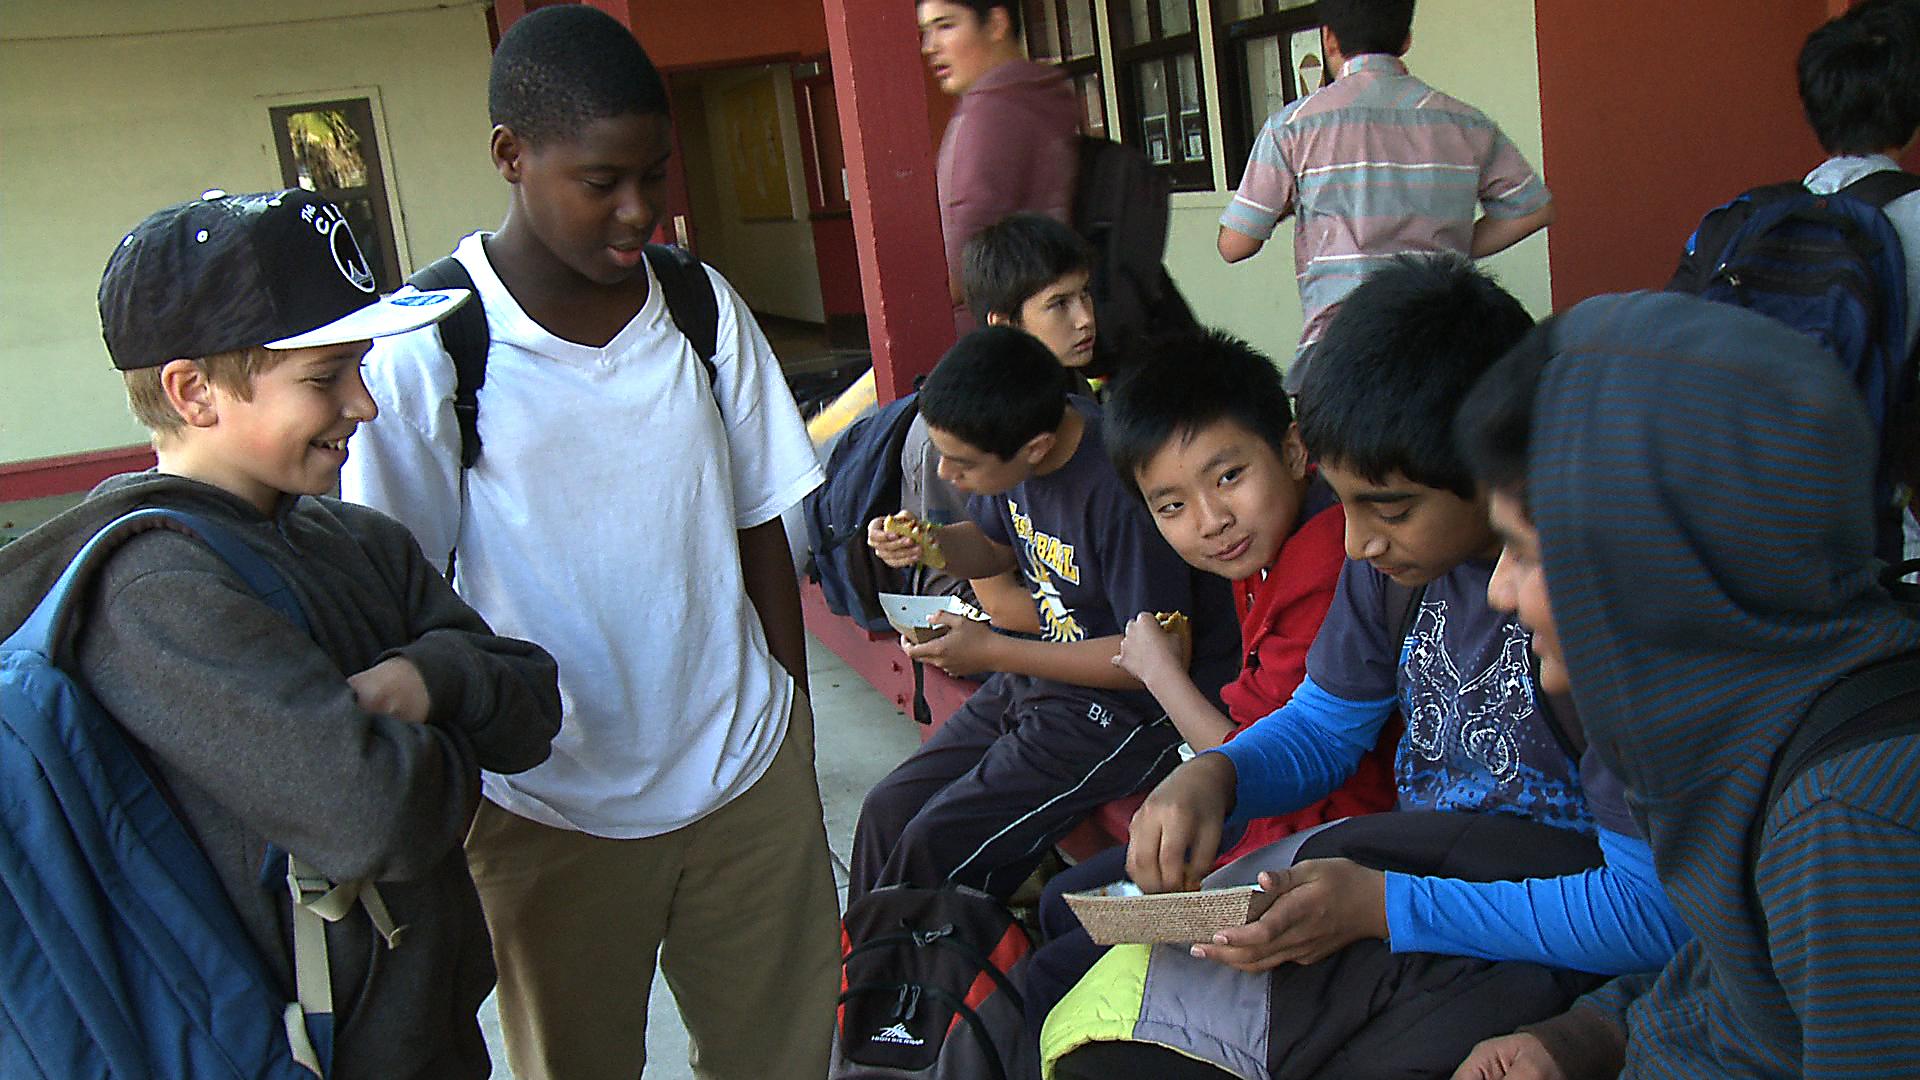 Students at Willard